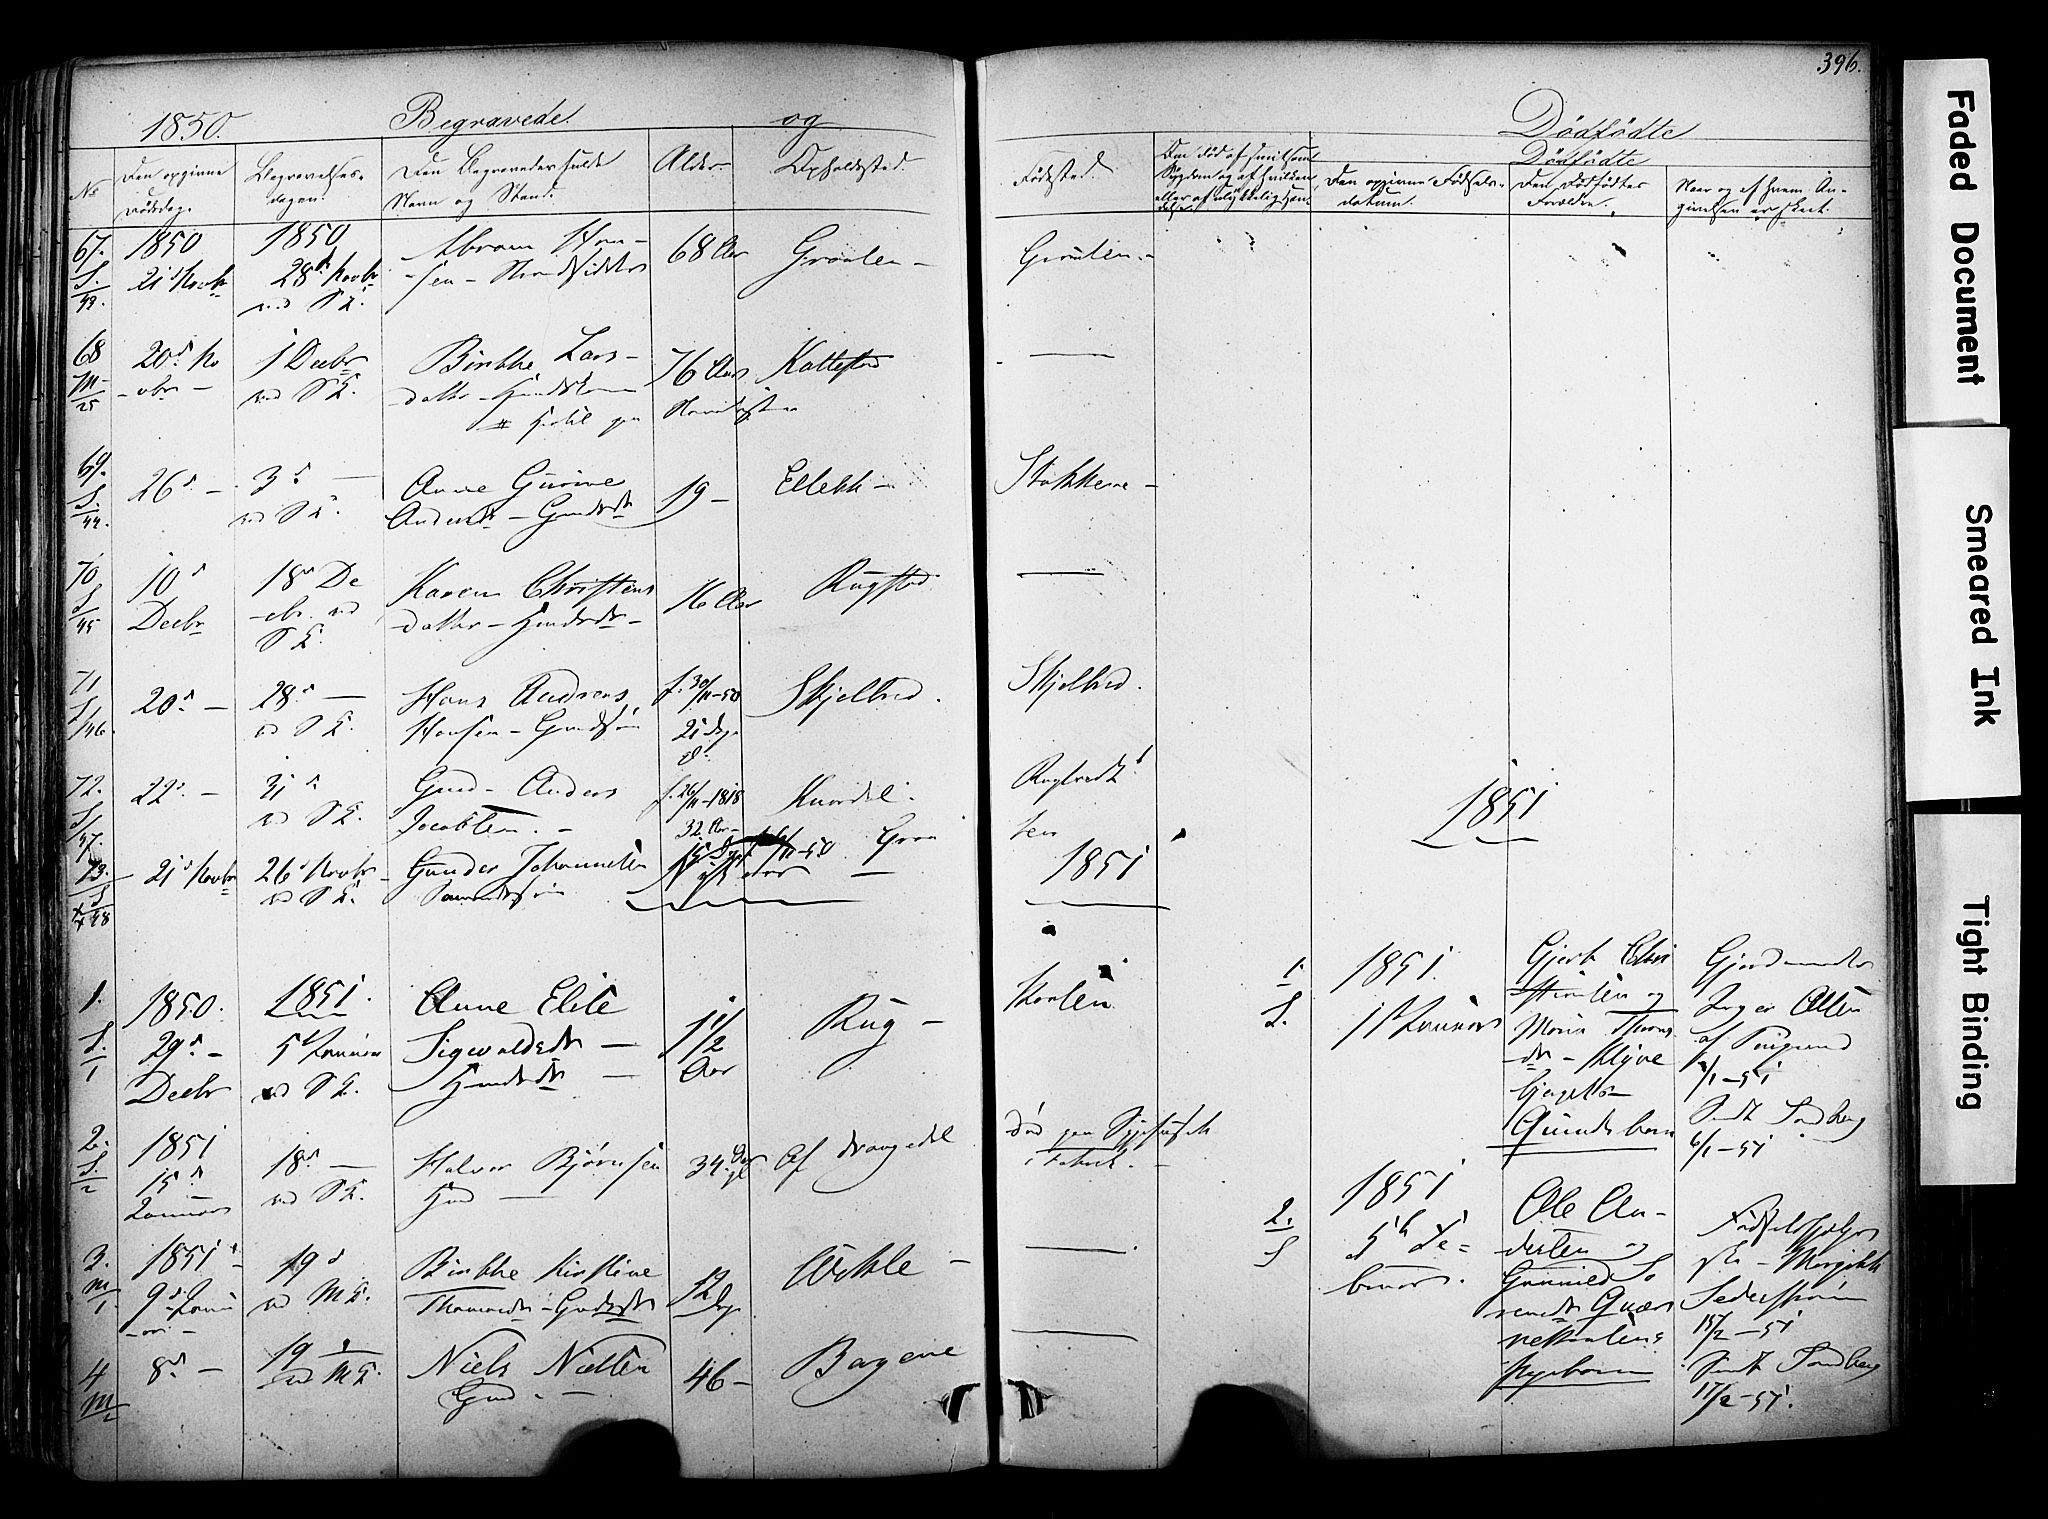 SAKO, Solum kirkebøker, F/Fa/L0006: Ministerialbok nr. I 6, 1844-1855, s. 396